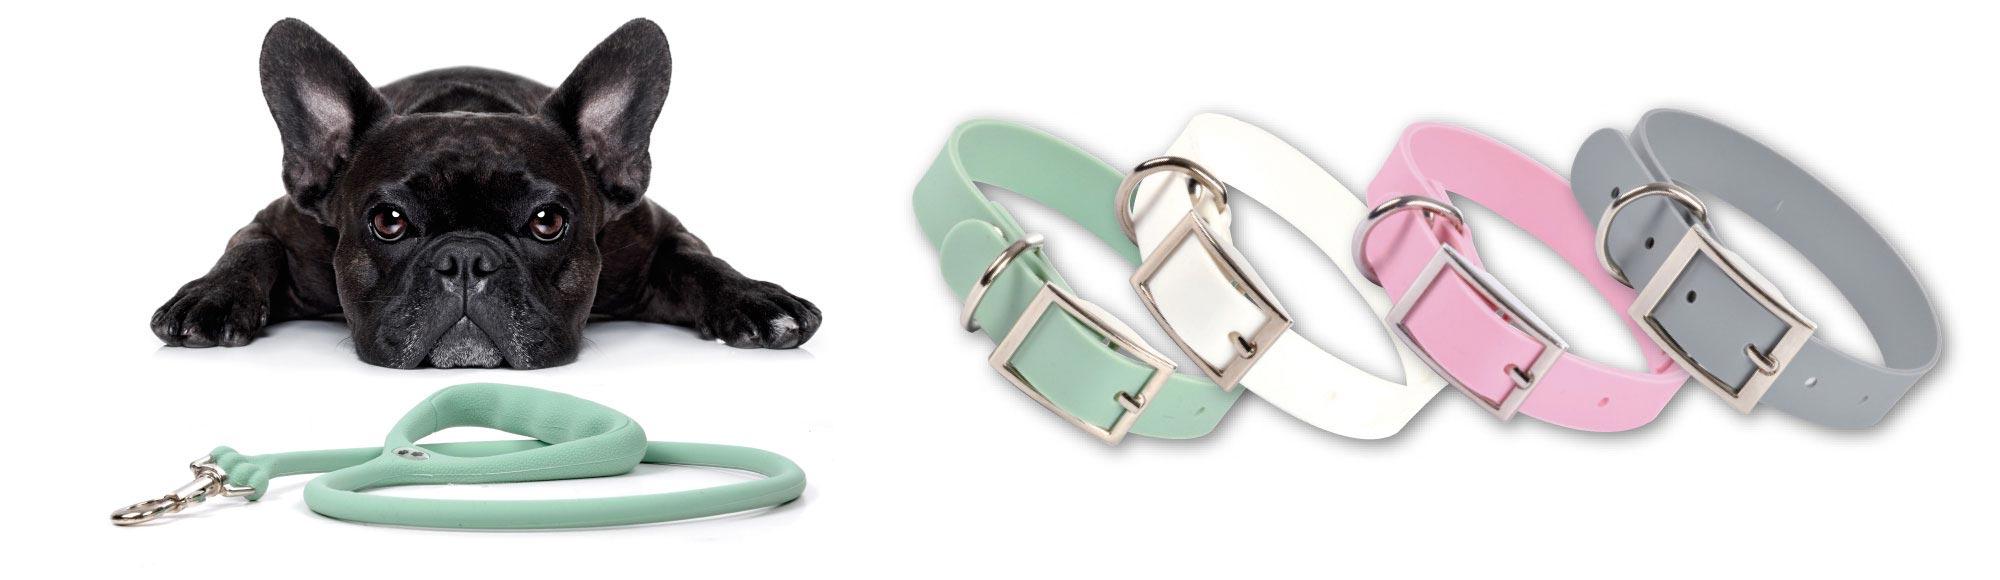 U10-love-story-pet range-saddlery-ice-silicon-collar